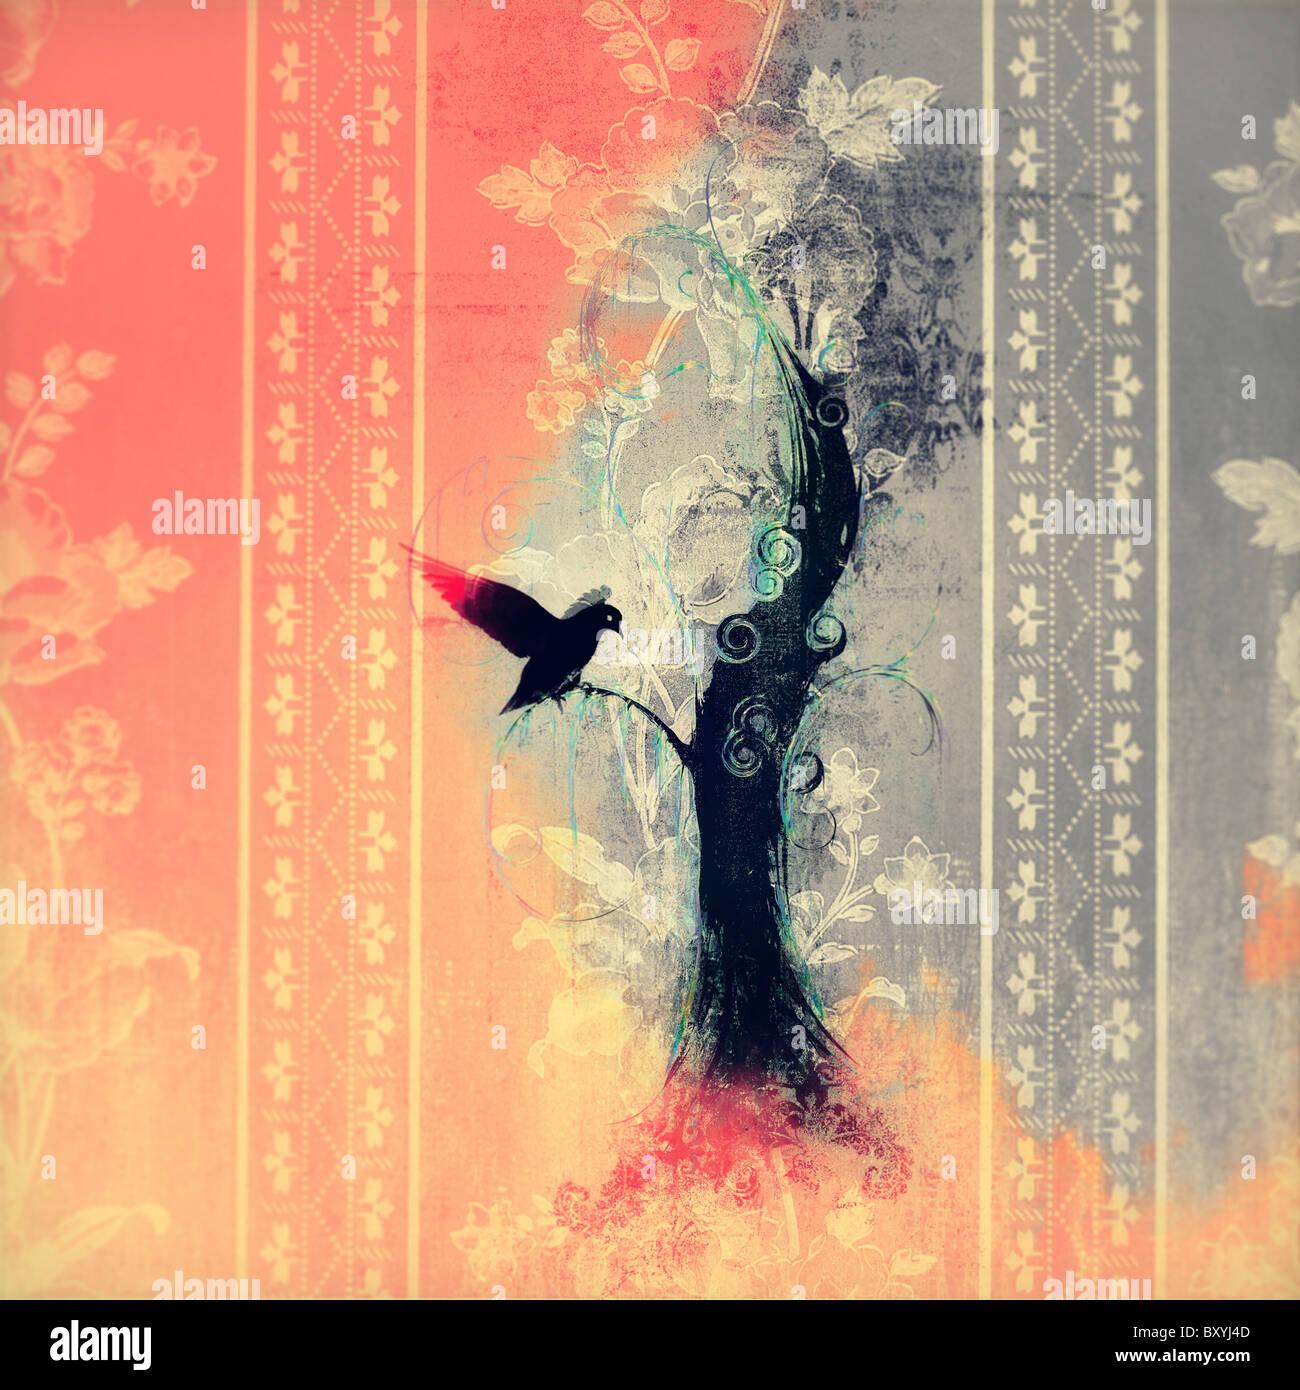 Image of black bird landing on tree, with fire around. - Stock Image